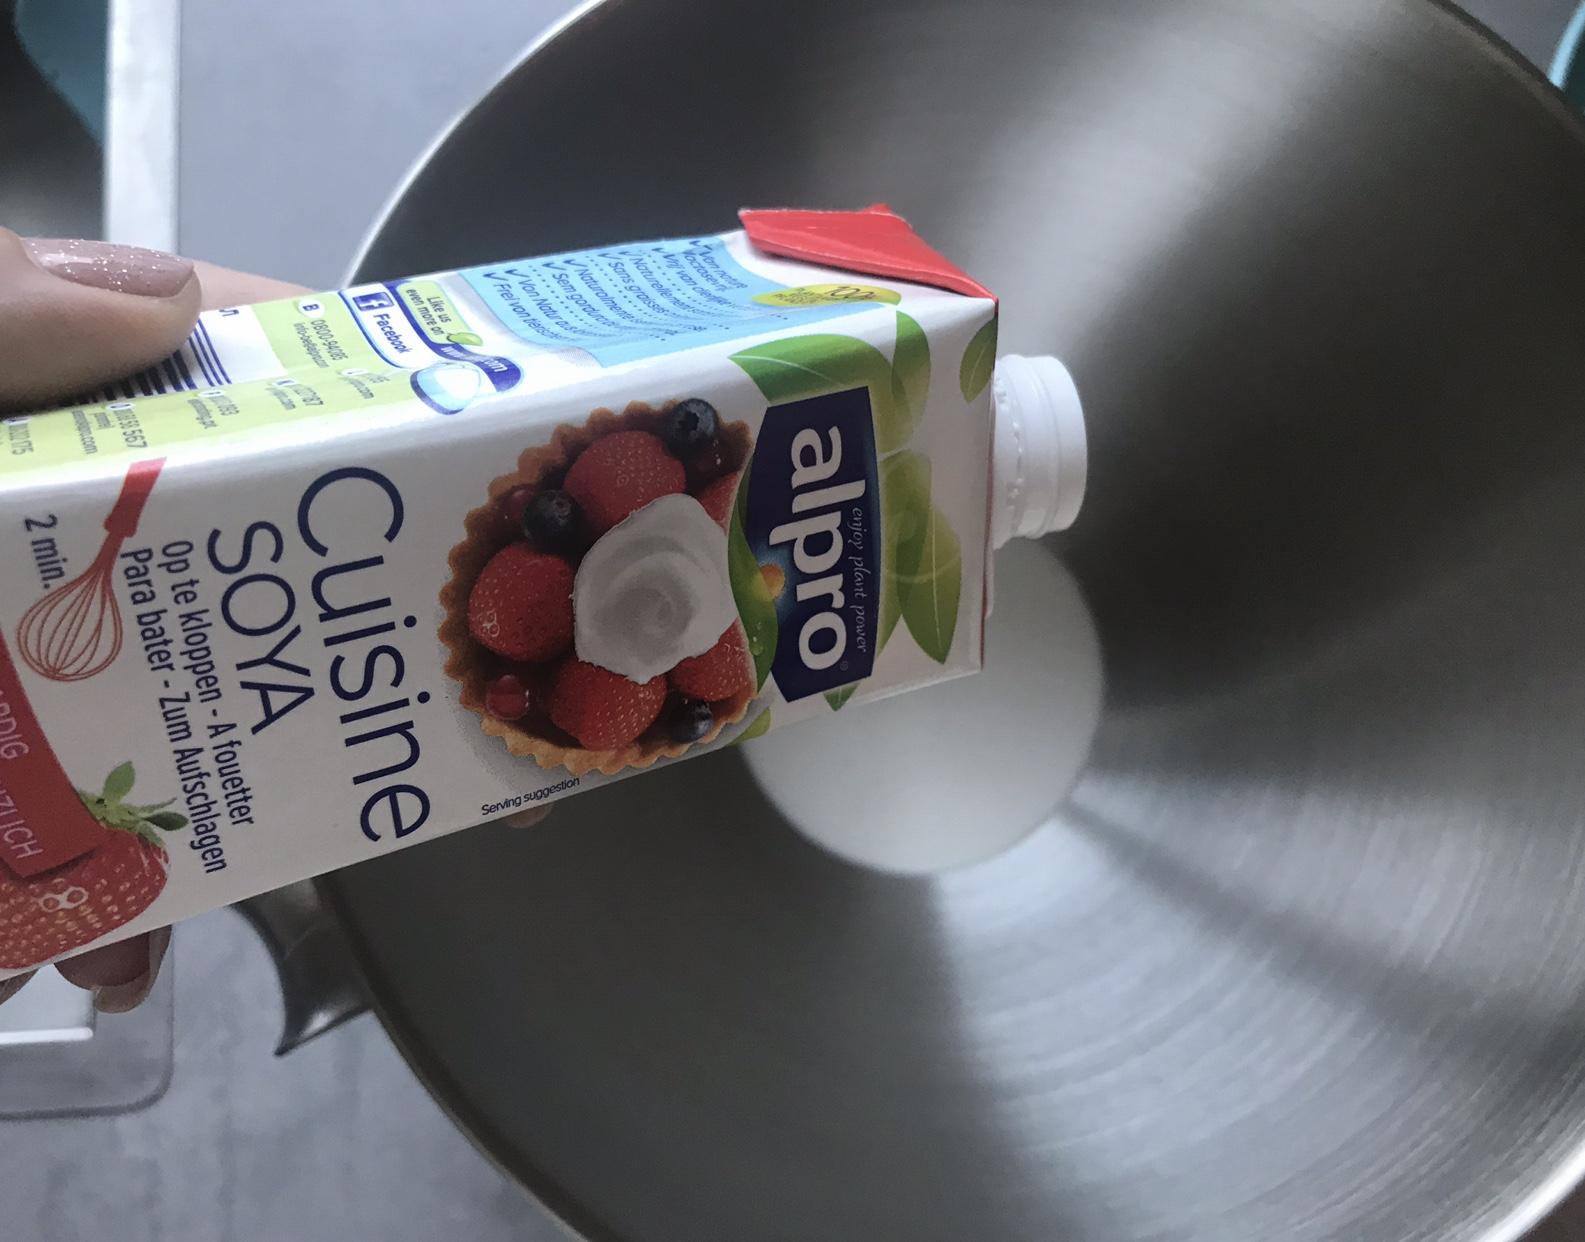 Alpro Cuisine Soya gieten in de mixkom